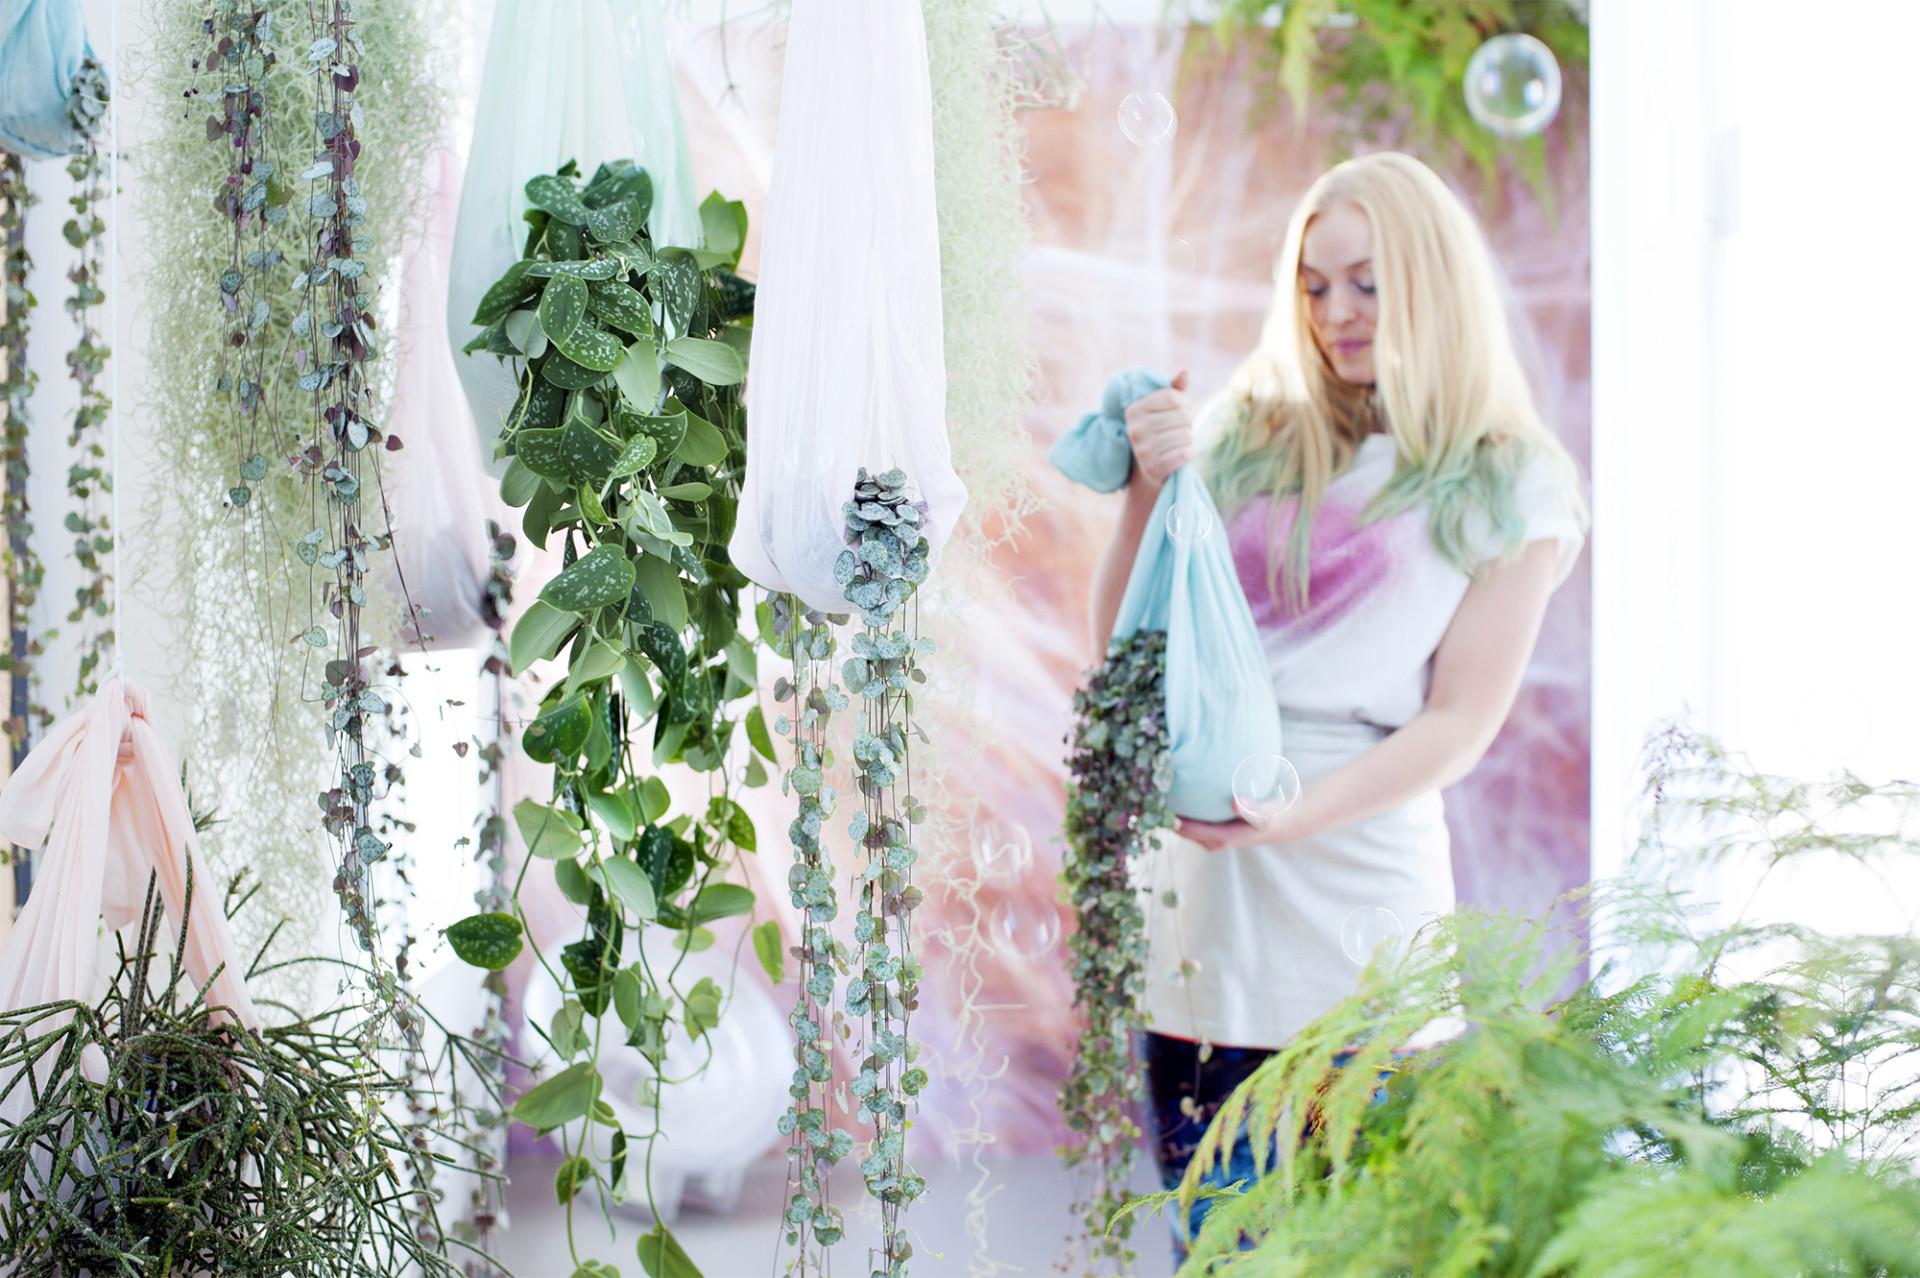 h ngende zimmerpflanzen sind die zimmerpflanzen des monats september 2016 javado. Black Bedroom Furniture Sets. Home Design Ideas